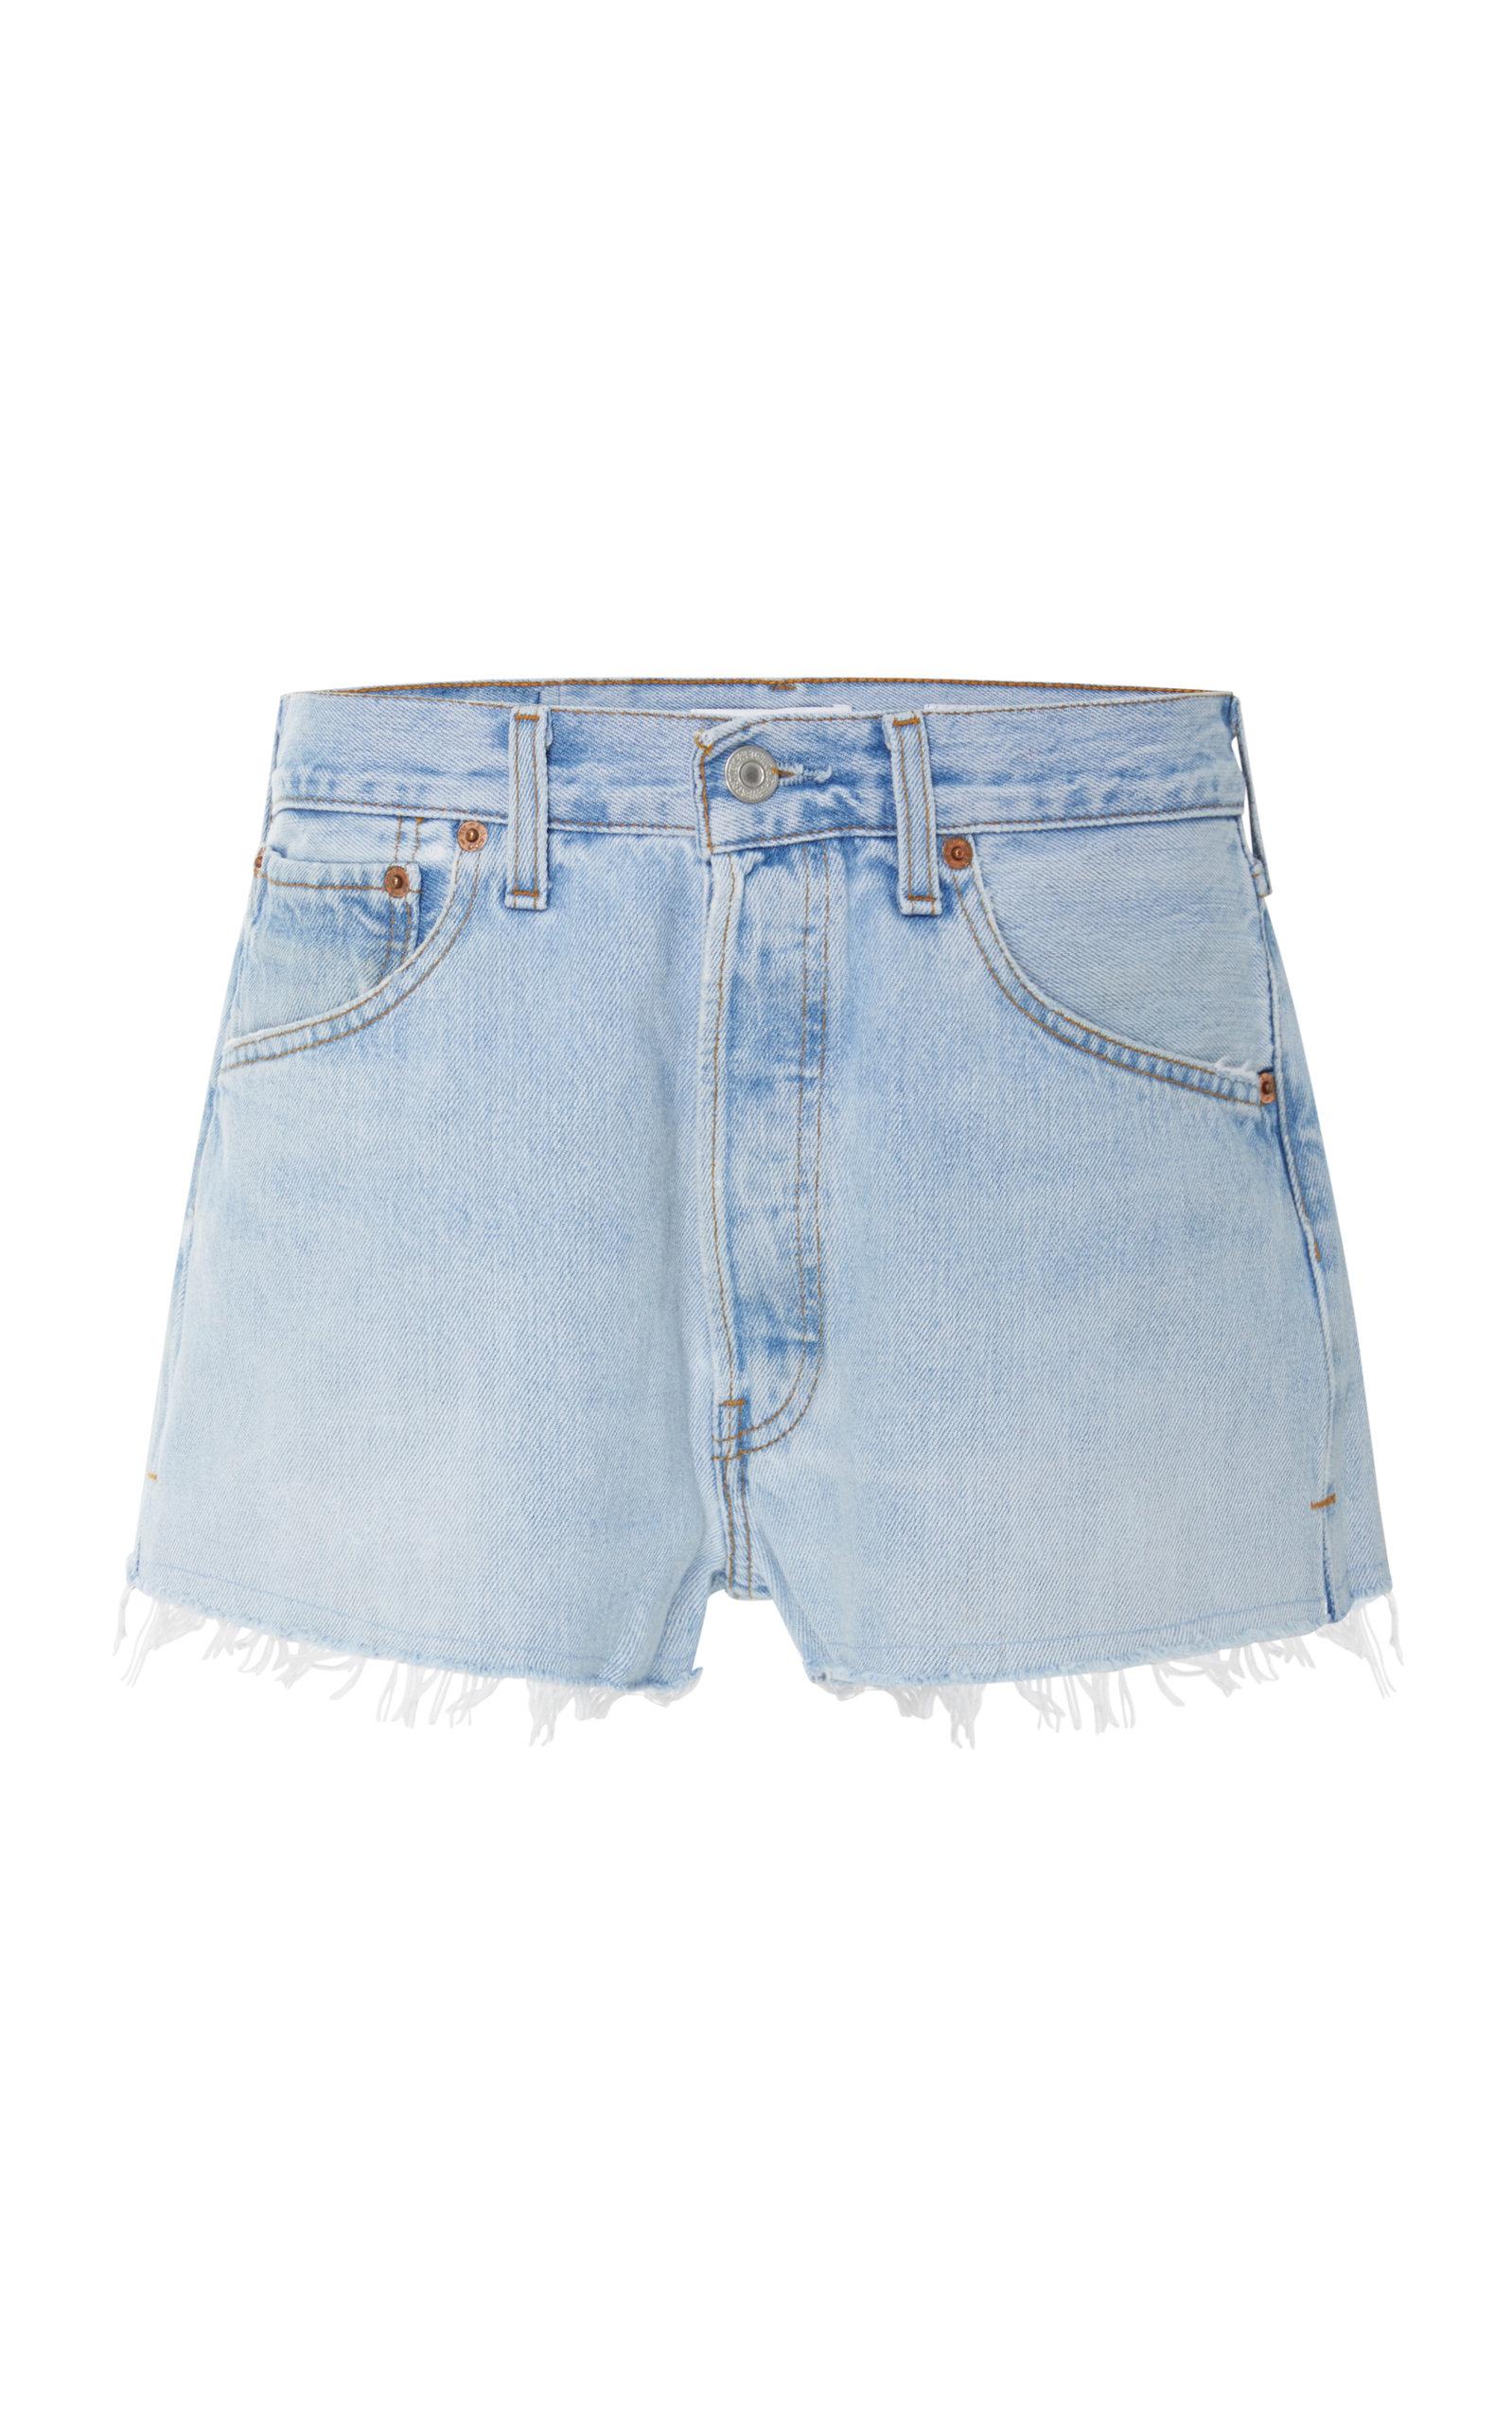 Levi's Shorts Vintage Denim Shorts Vintage Levi's Denim BodrexC